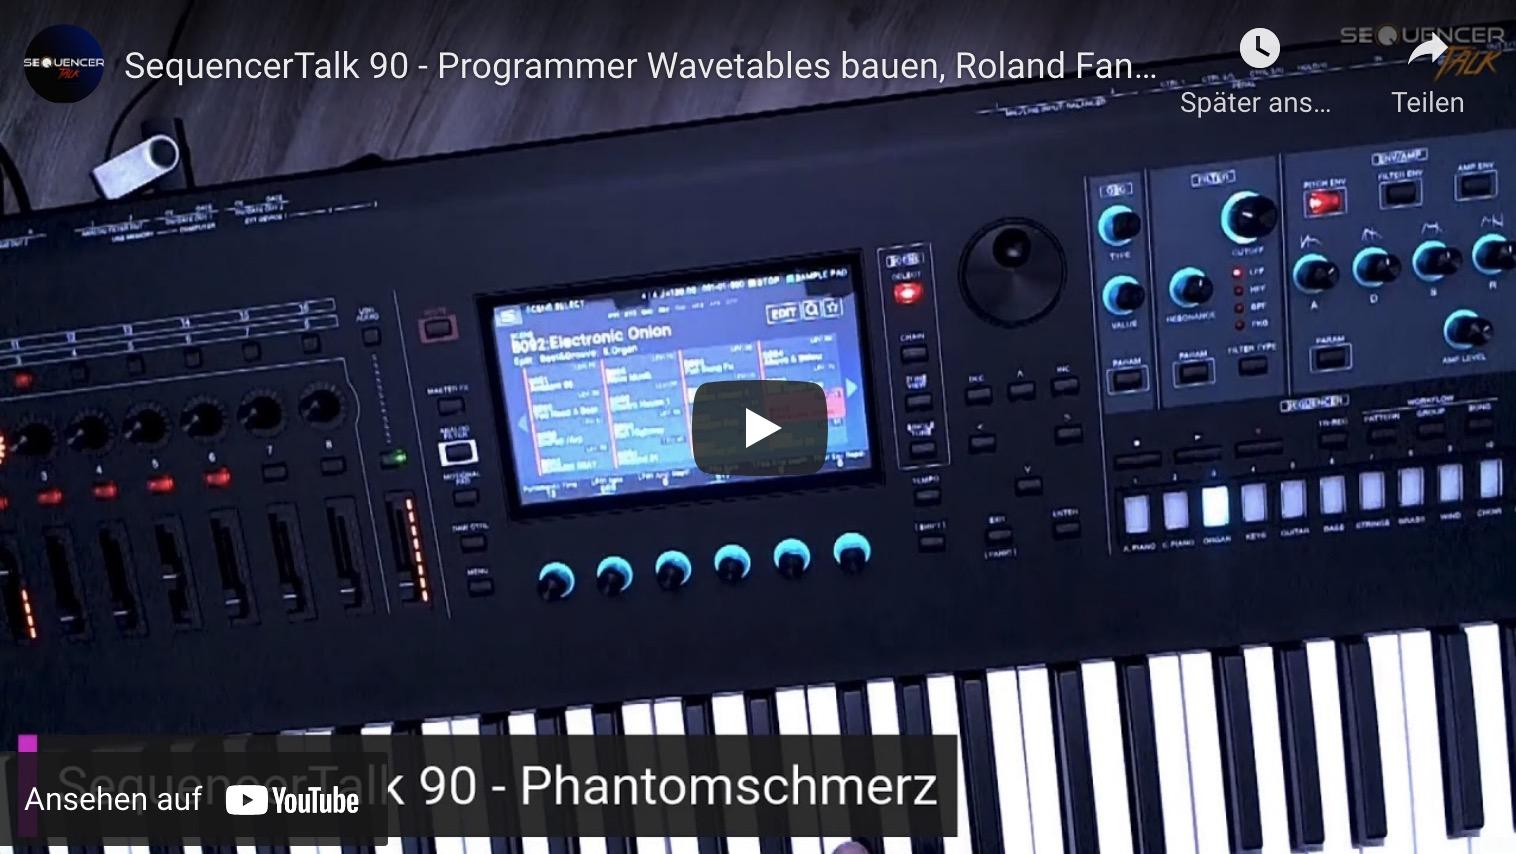 SequencerTalk 90 Fantom Programmer